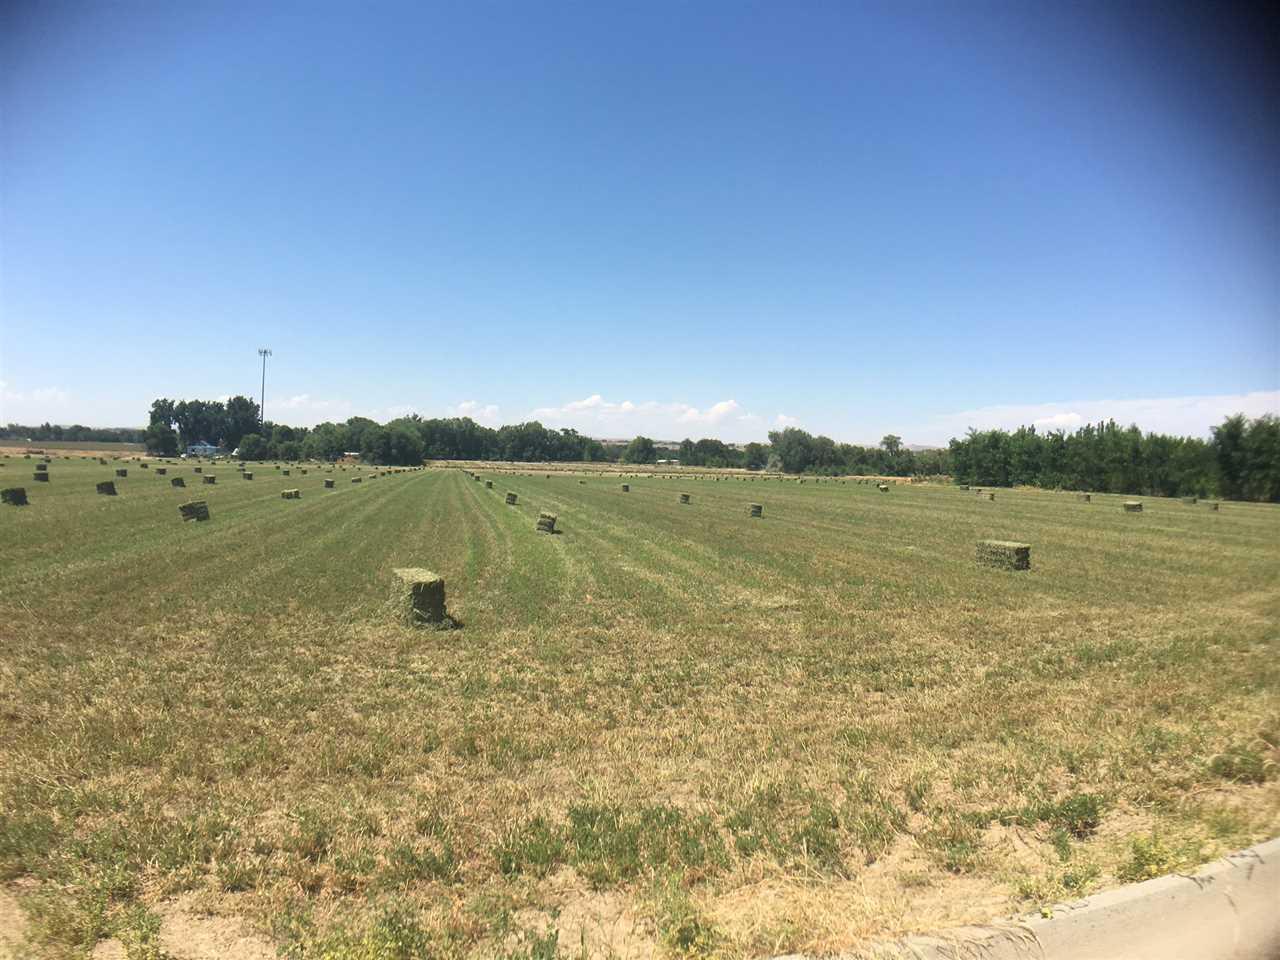 TBD Iowa Ave,Payette,Idaho 83661,Farm & Ranch,TBD Iowa Ave,98670556